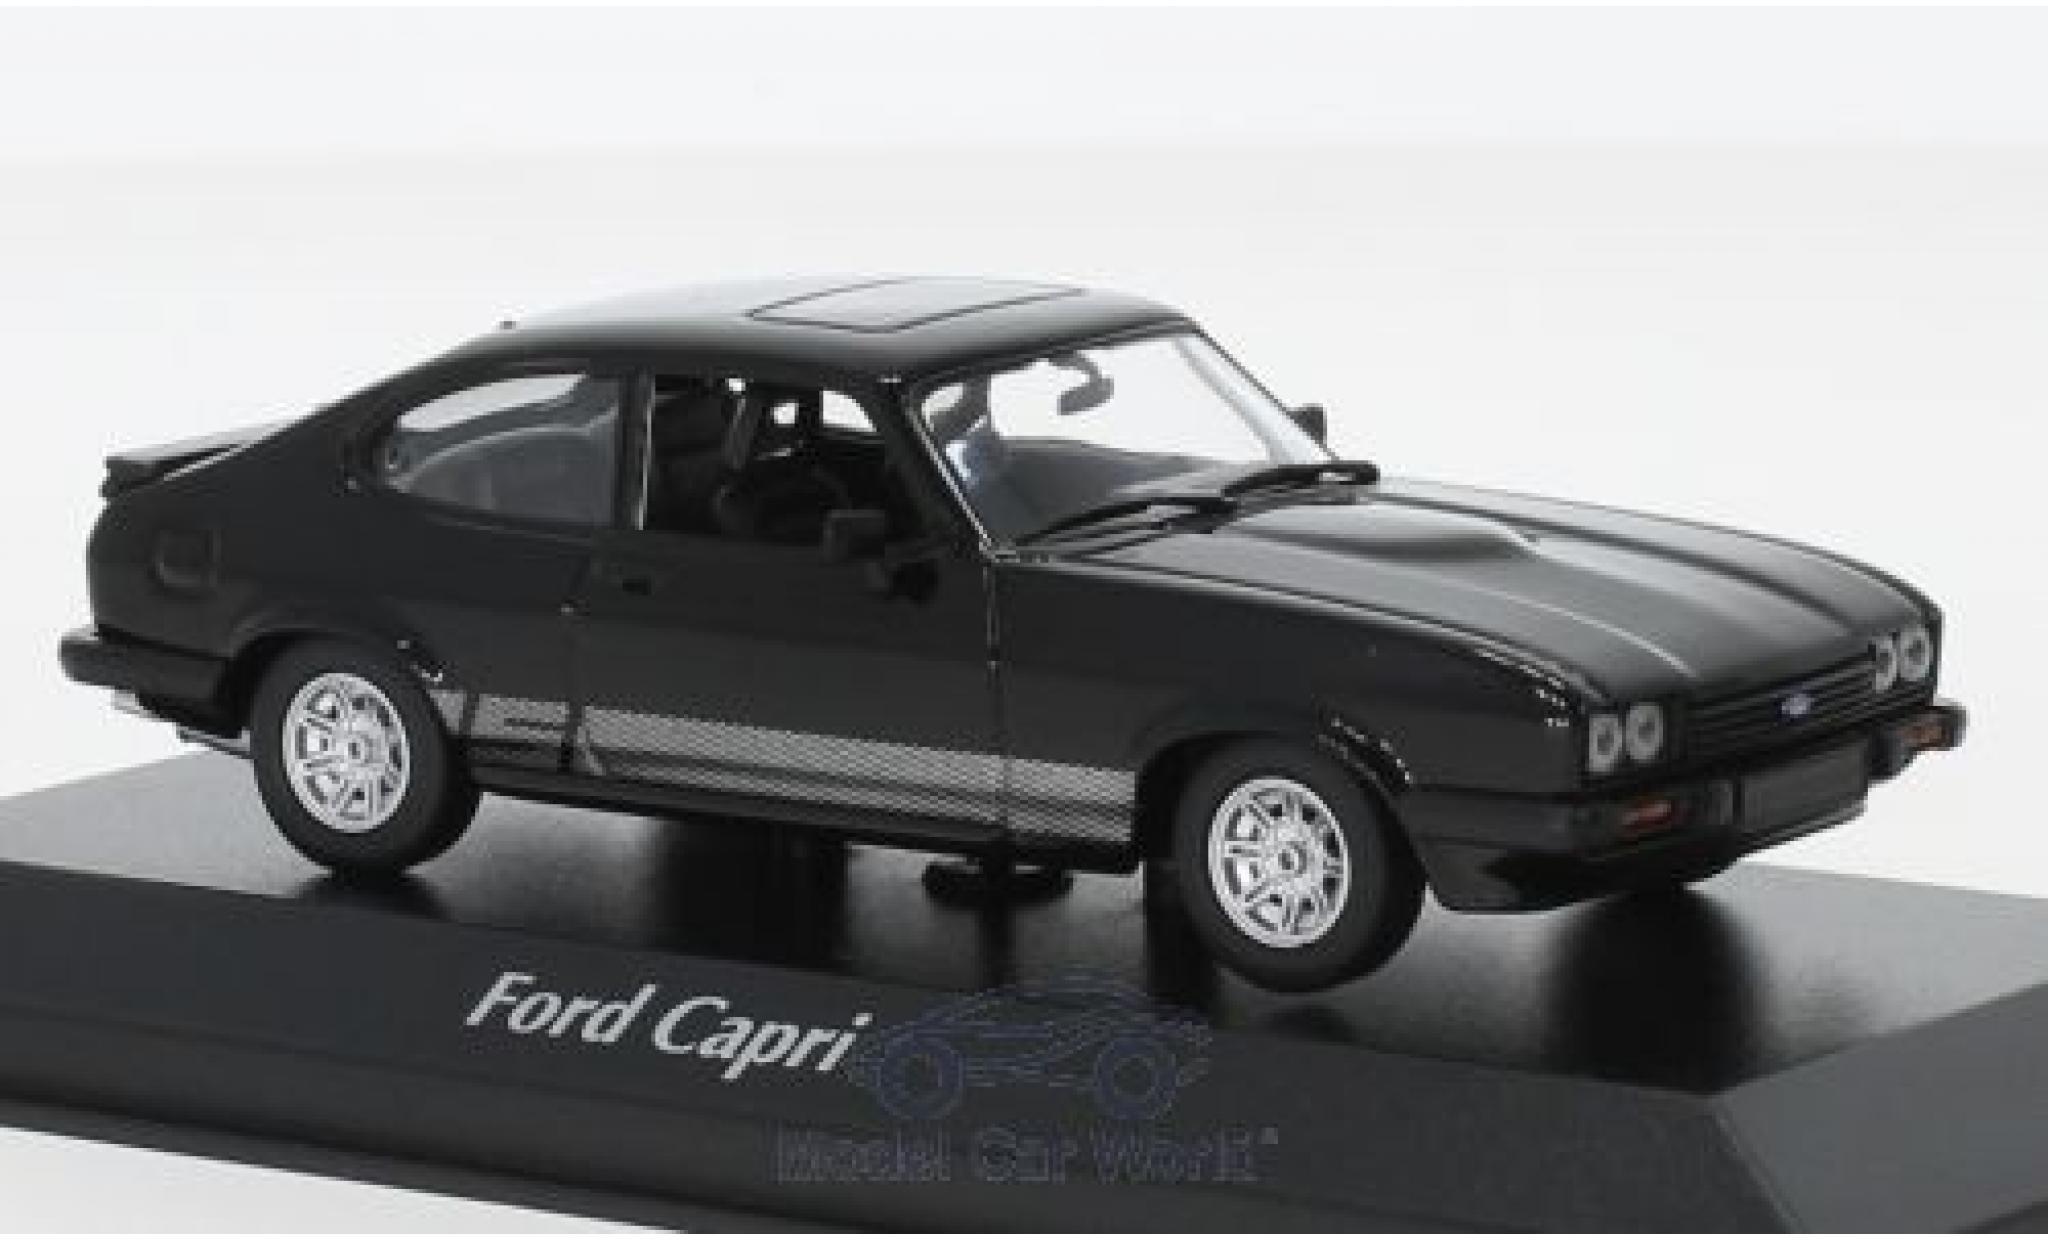 Ford Capri 1/43 Maxichamps MKIII 3.0 S noire 1982